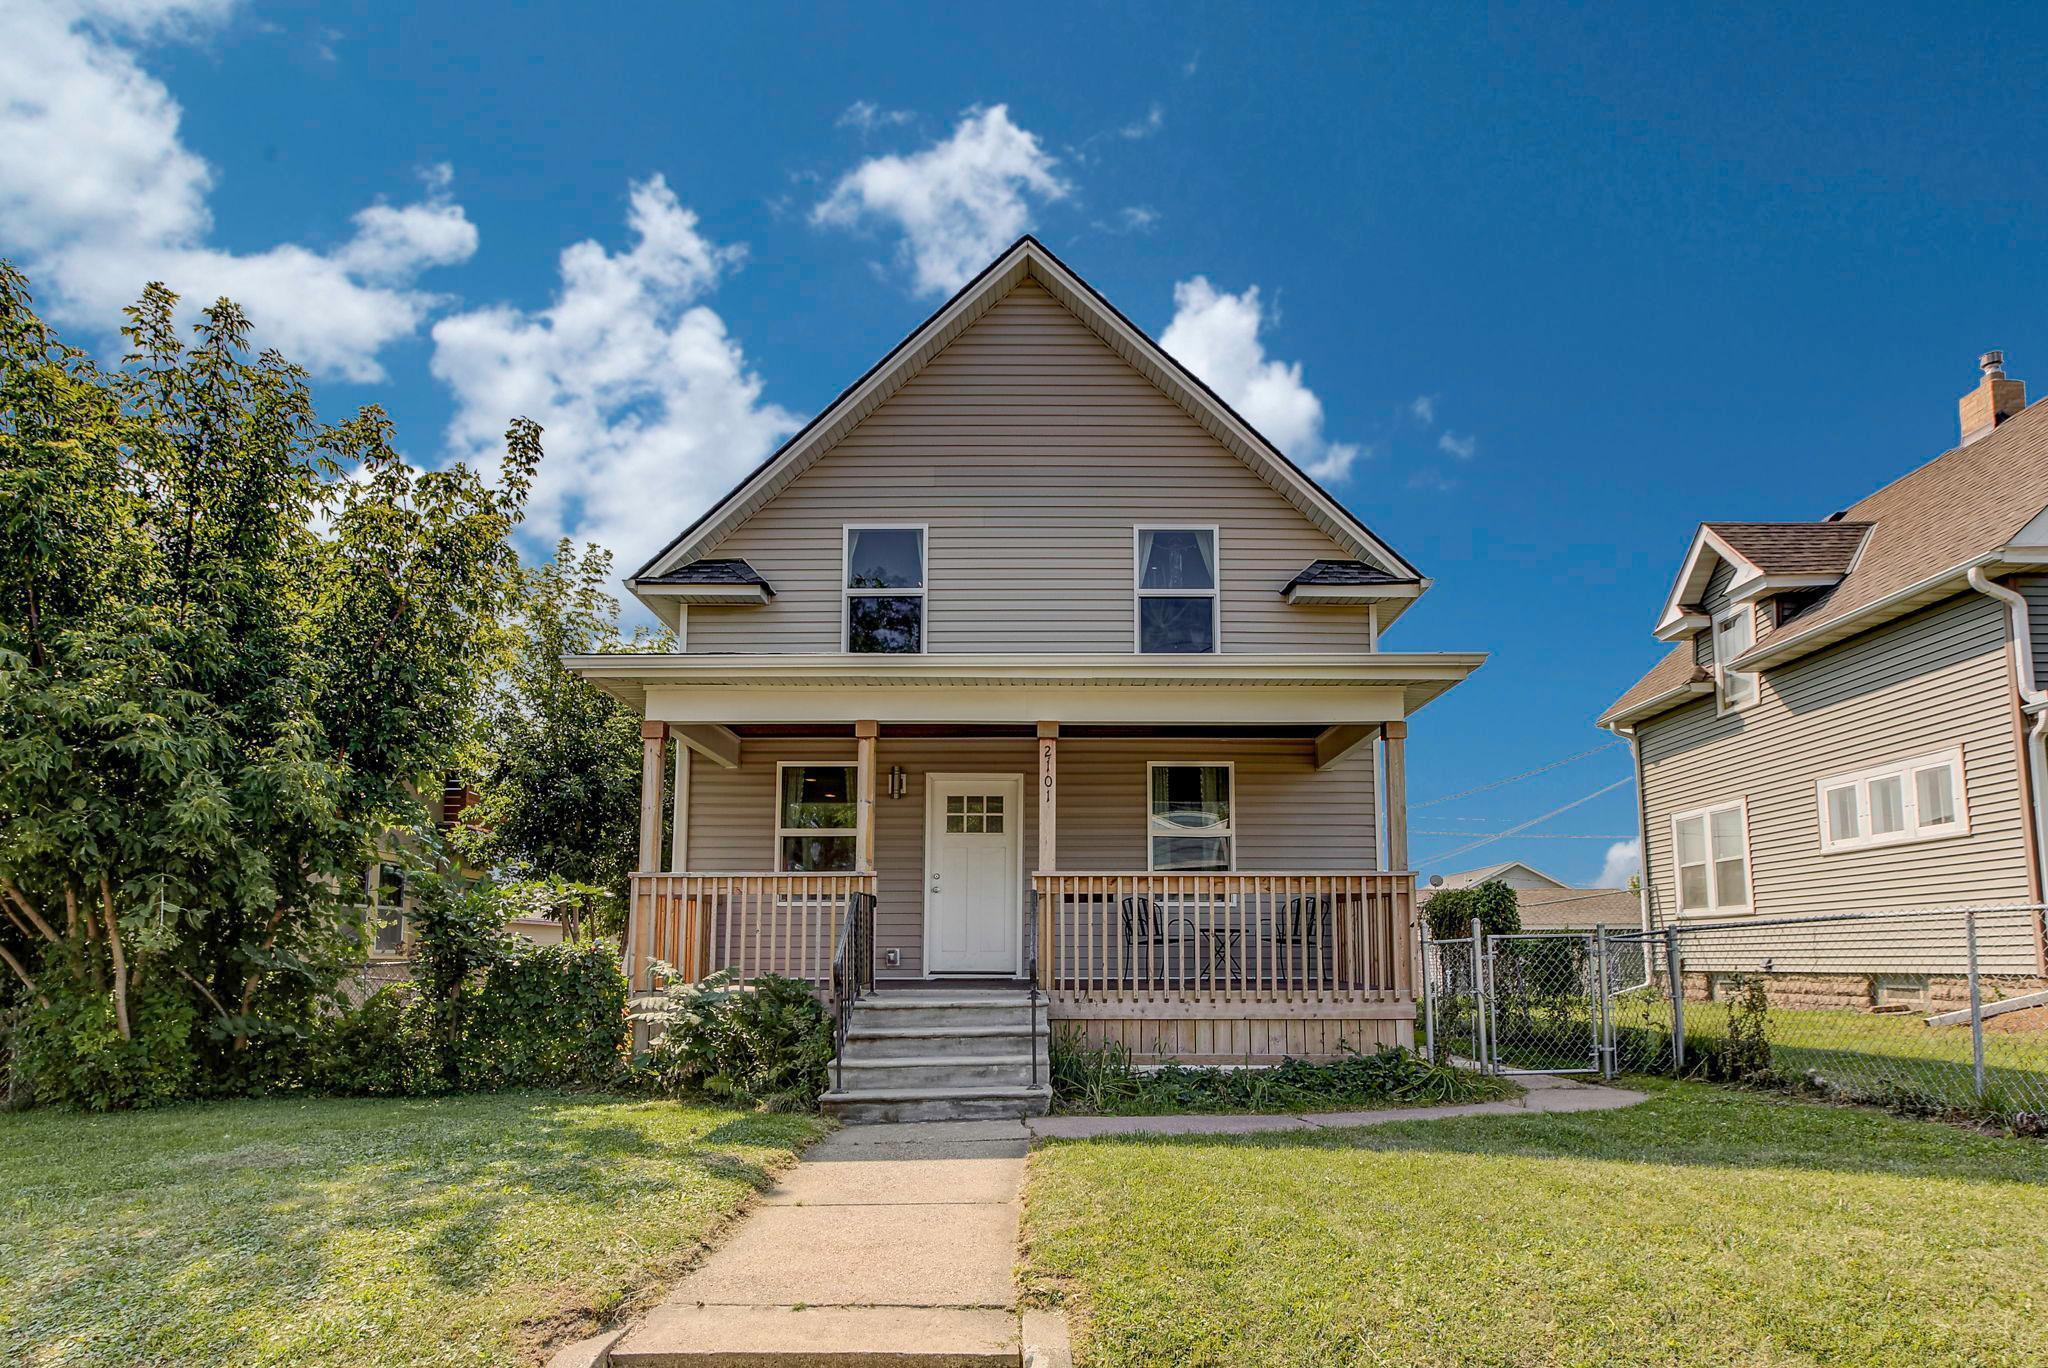 2101 26th Avenue N Property Photo - Minneapolis, MN real estate listing